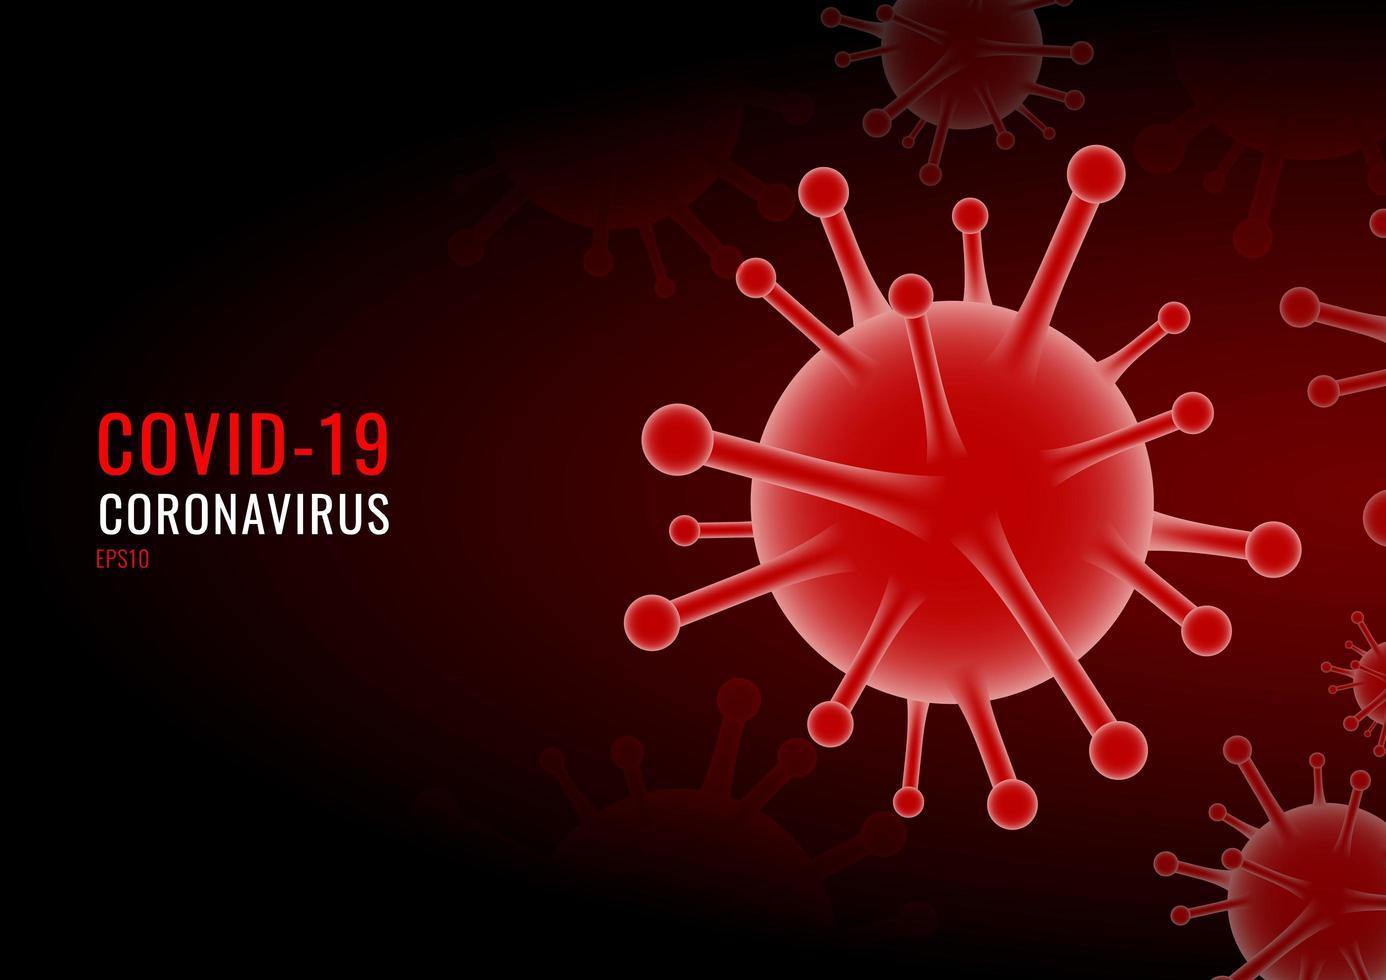 coronavirus covid-19 virus röd bakgrund vektor